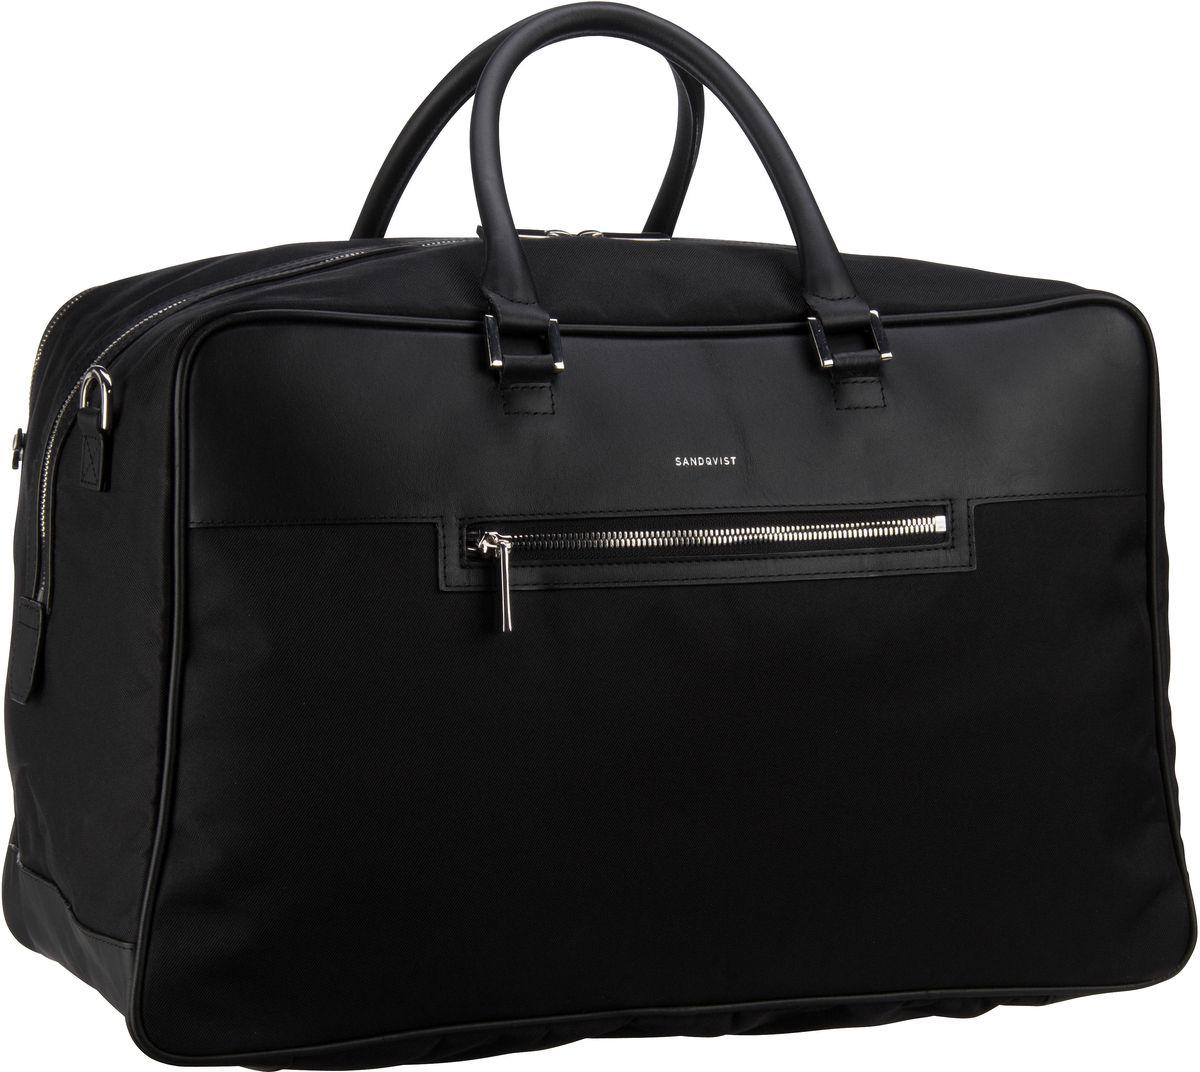 Sandqvist Weekender Mattias Weekend Bag Black (28 Liter)